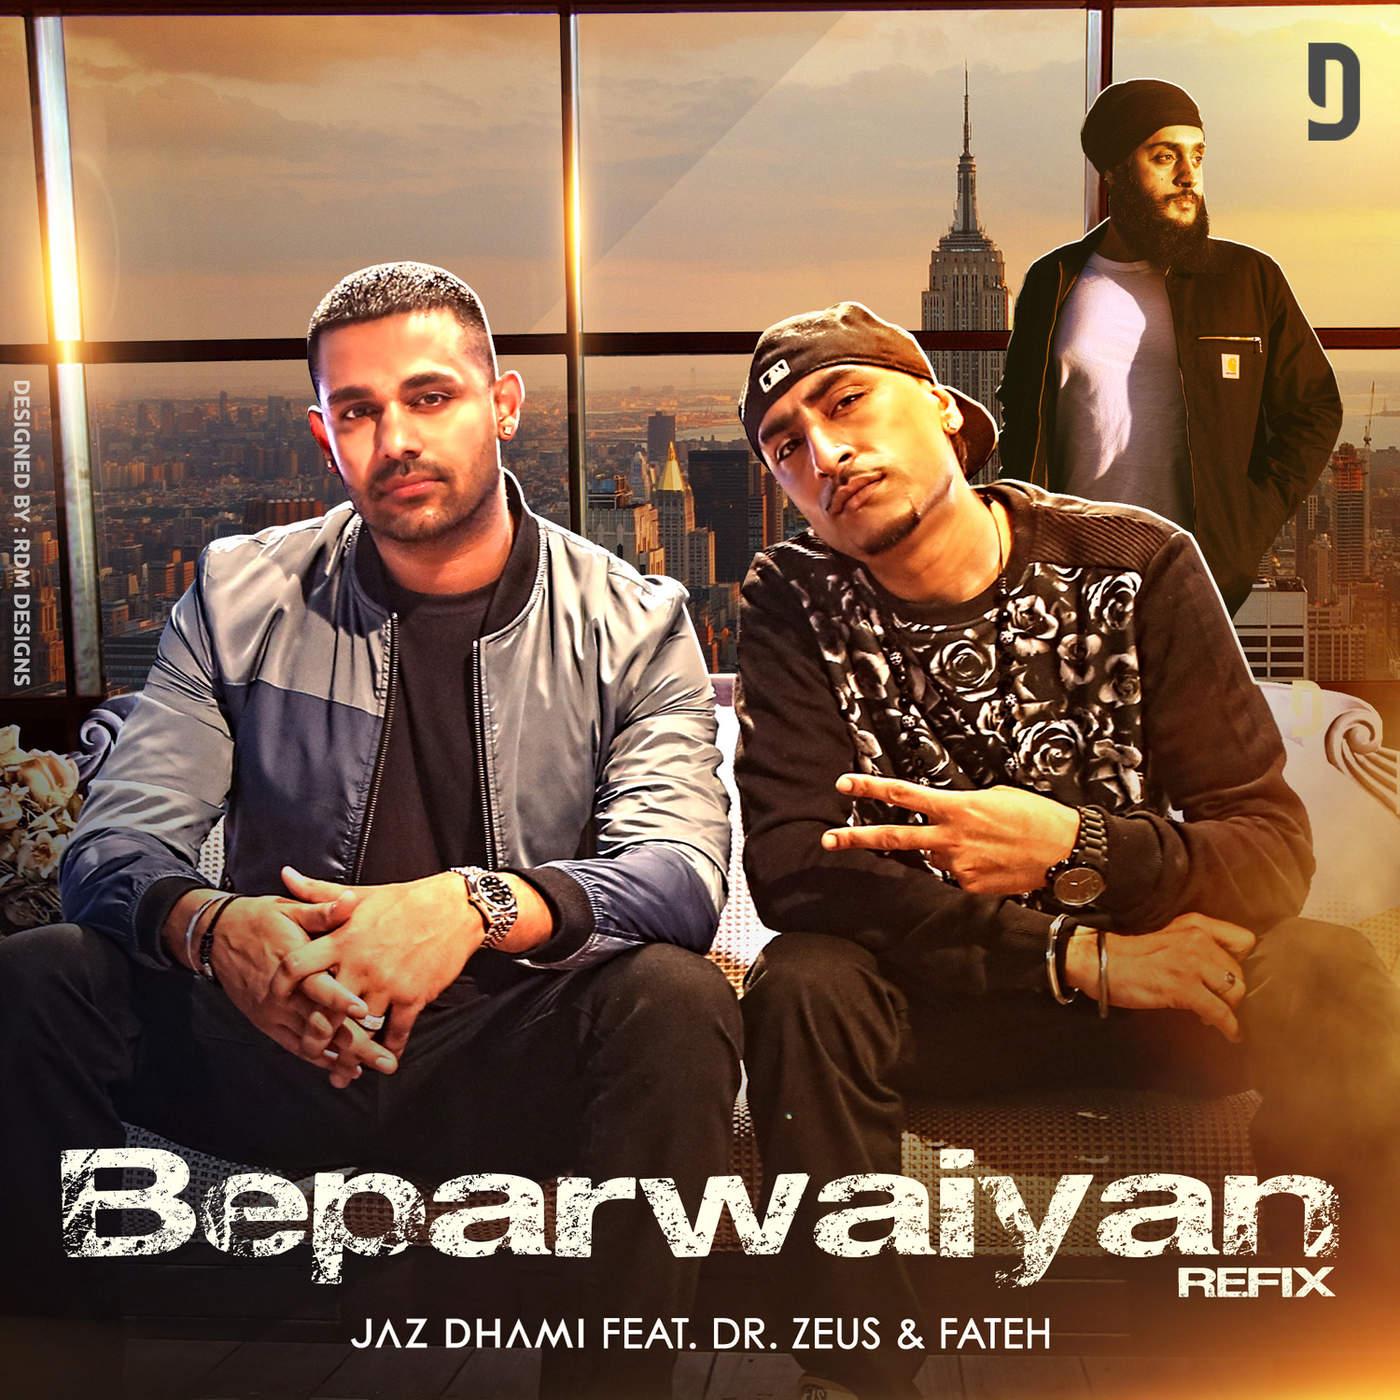 Jaz Dhami - Beparwaiyan Refix (feat. Dr. Zeus & Fateh) - Single